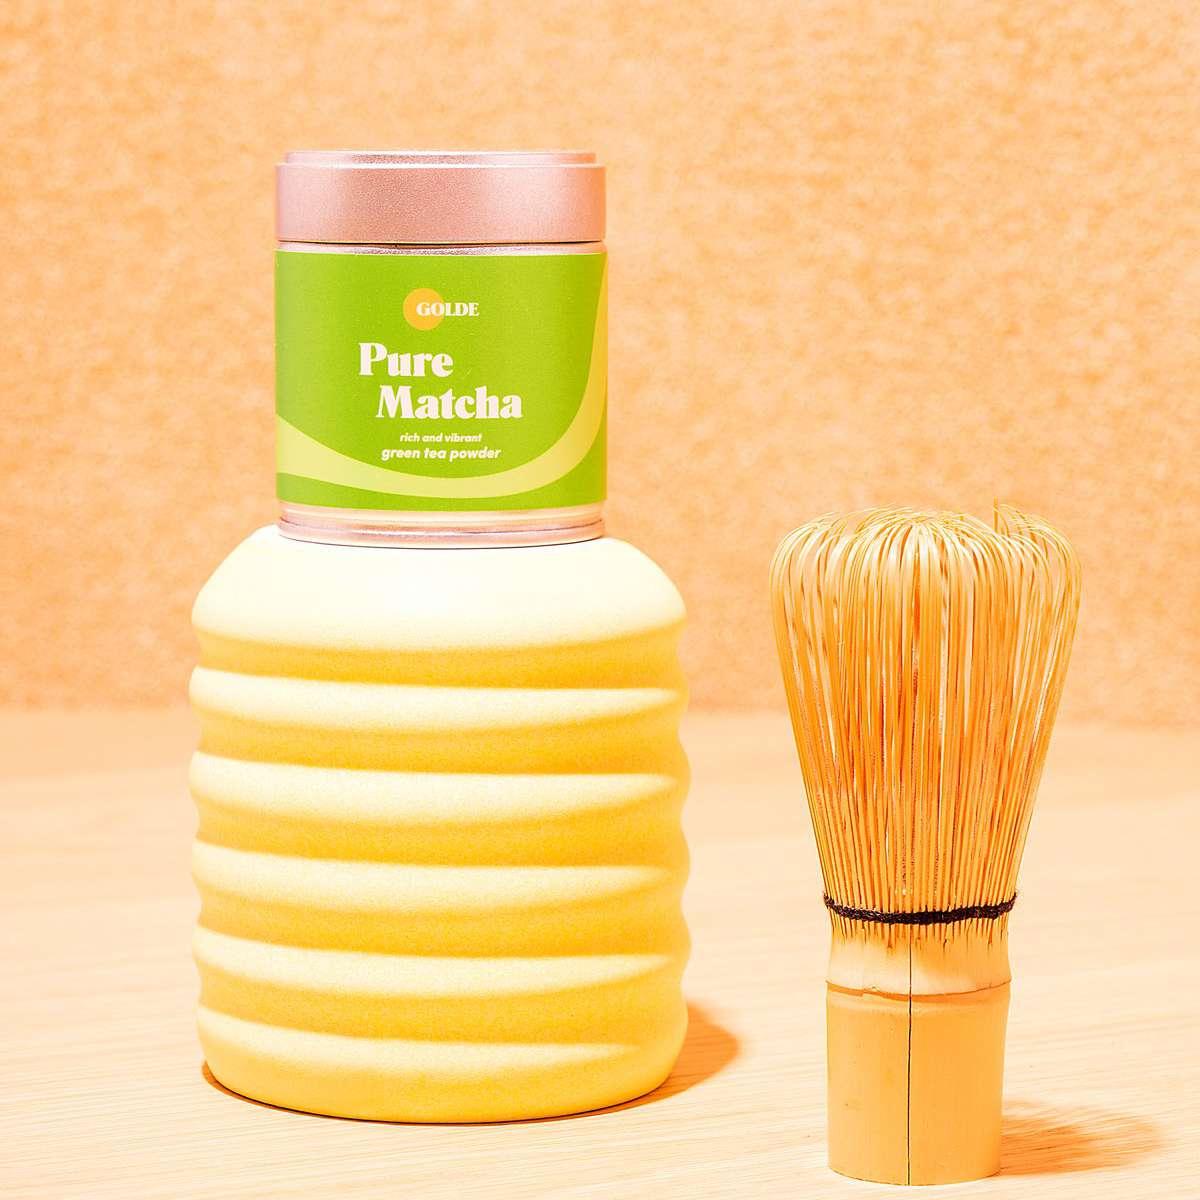 Golde Make Your Matcha Kit